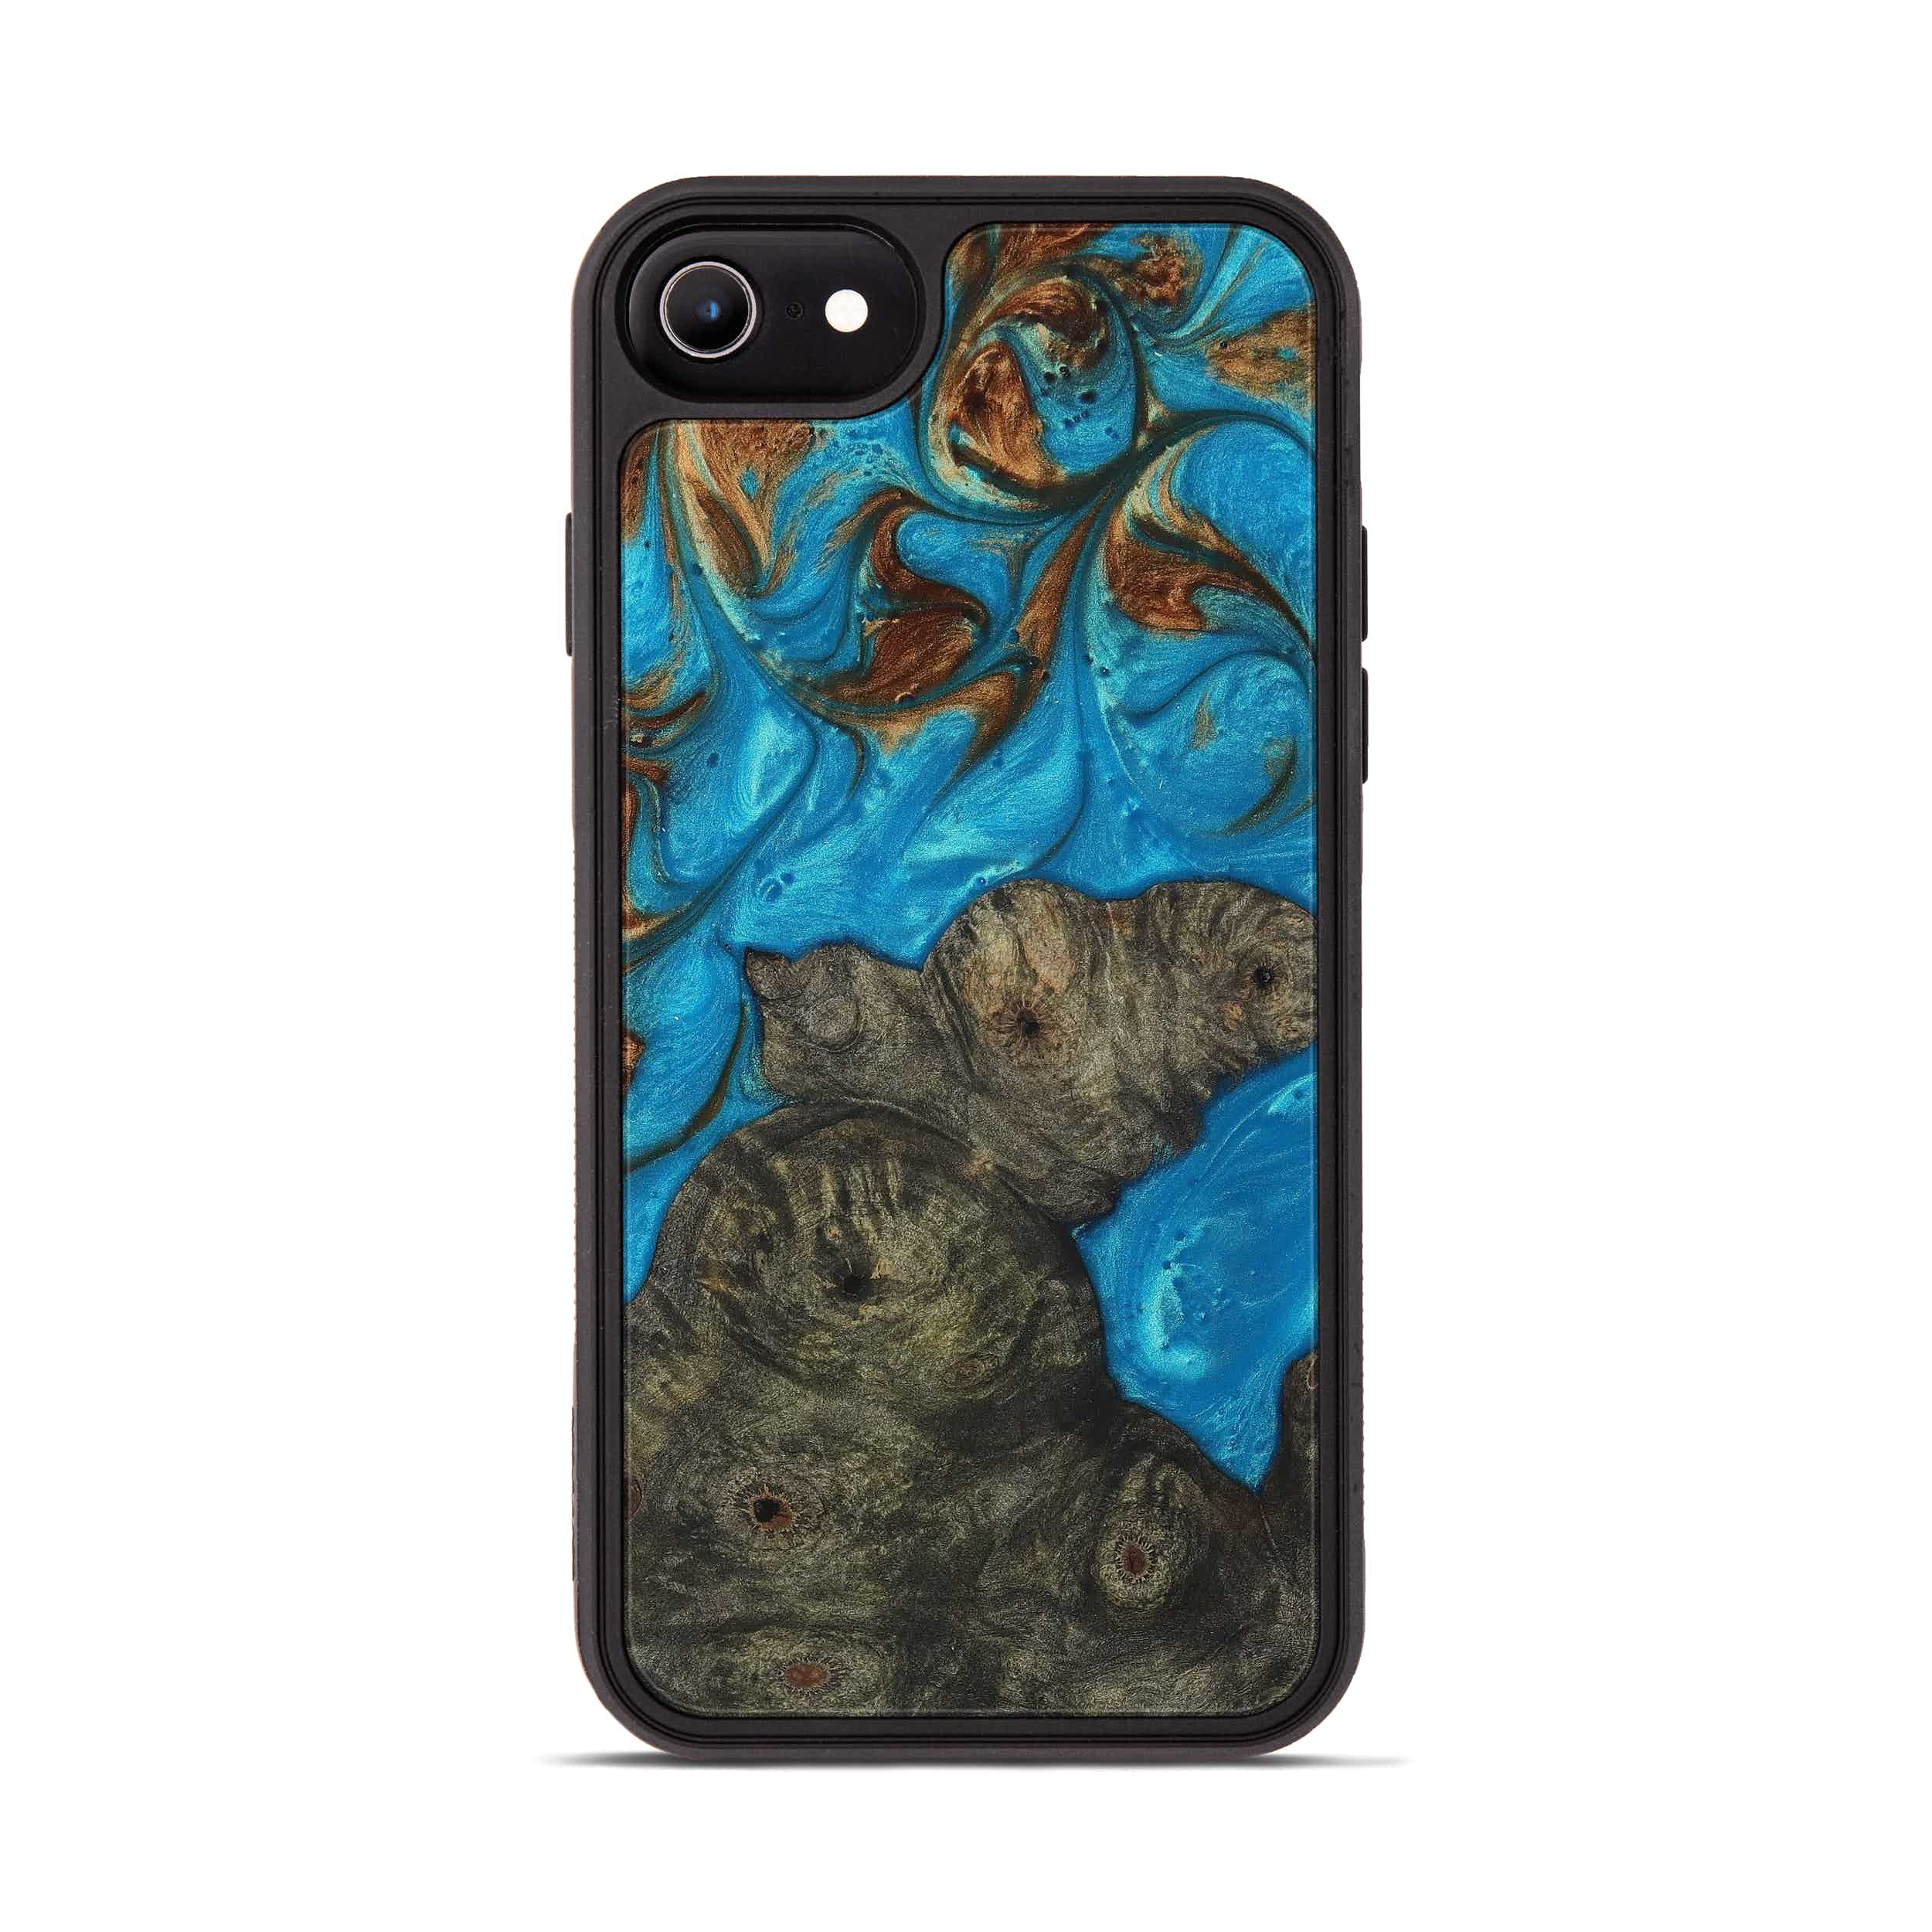 iPhone 6s Wood+Resin Phone Case - Junina (Teal & Gold, 397232)